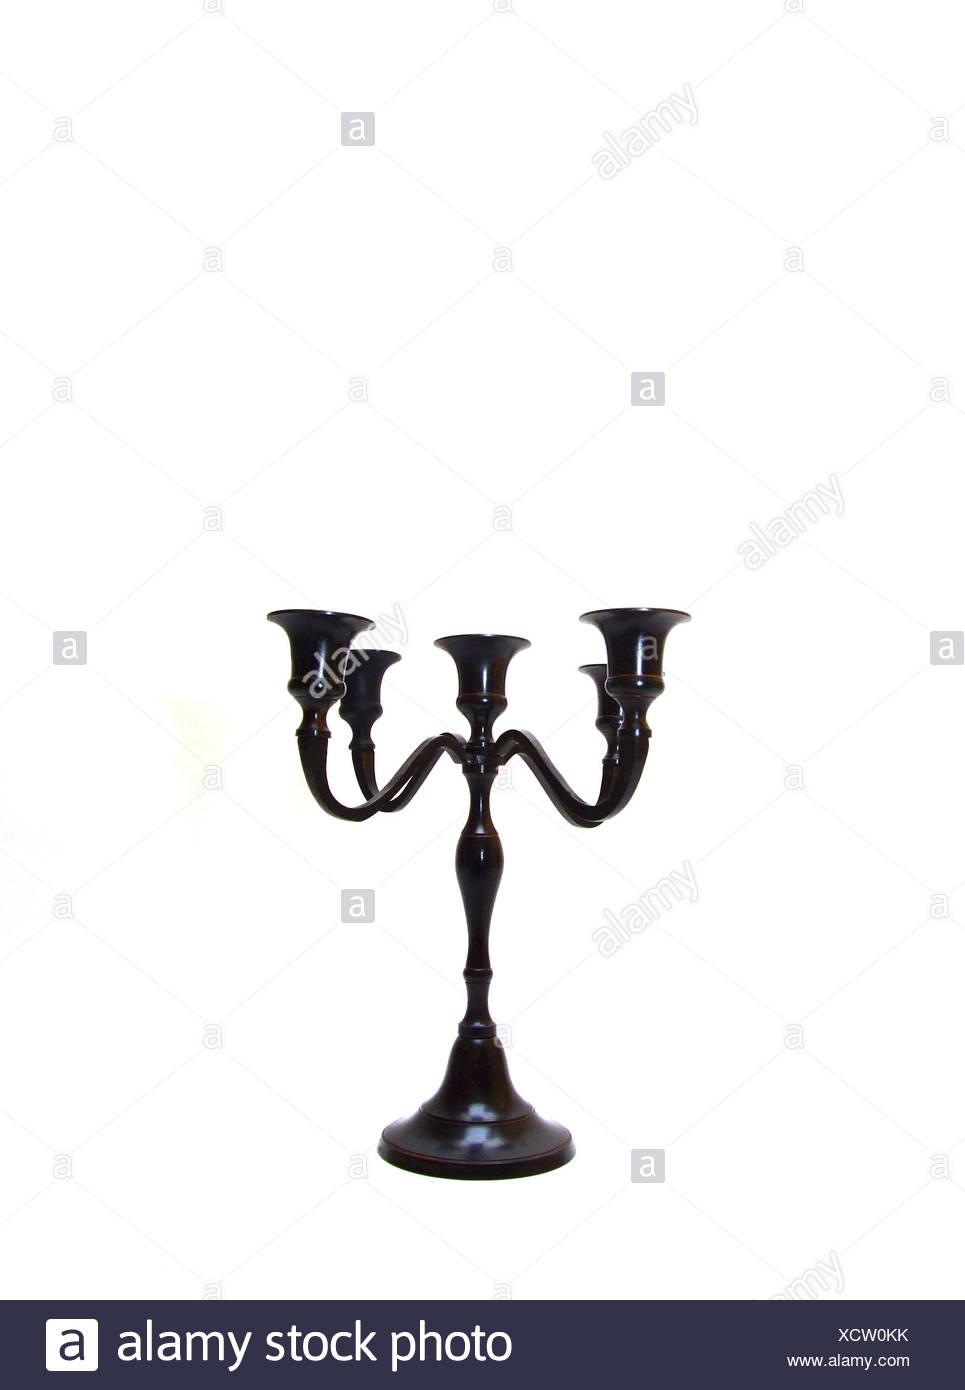 Kerzenständer / candle holder - Stock Image